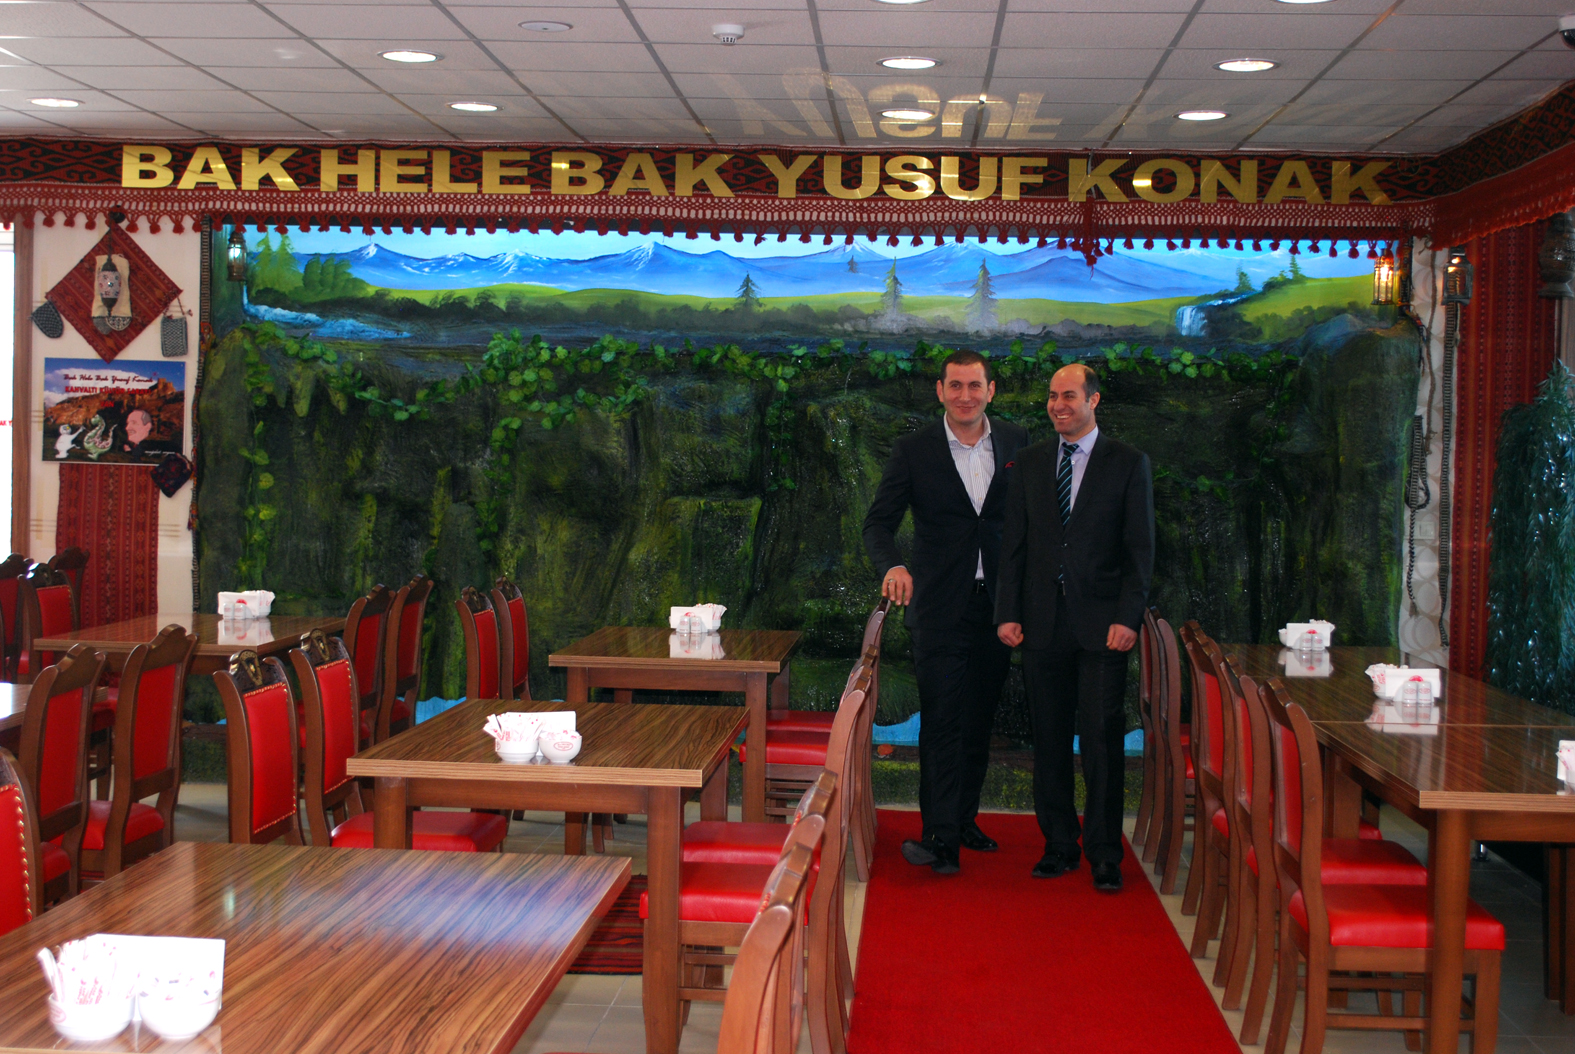 Bak-Hele-Bak-Yusuf-Konak رستوران ها و کافه های شهر وان